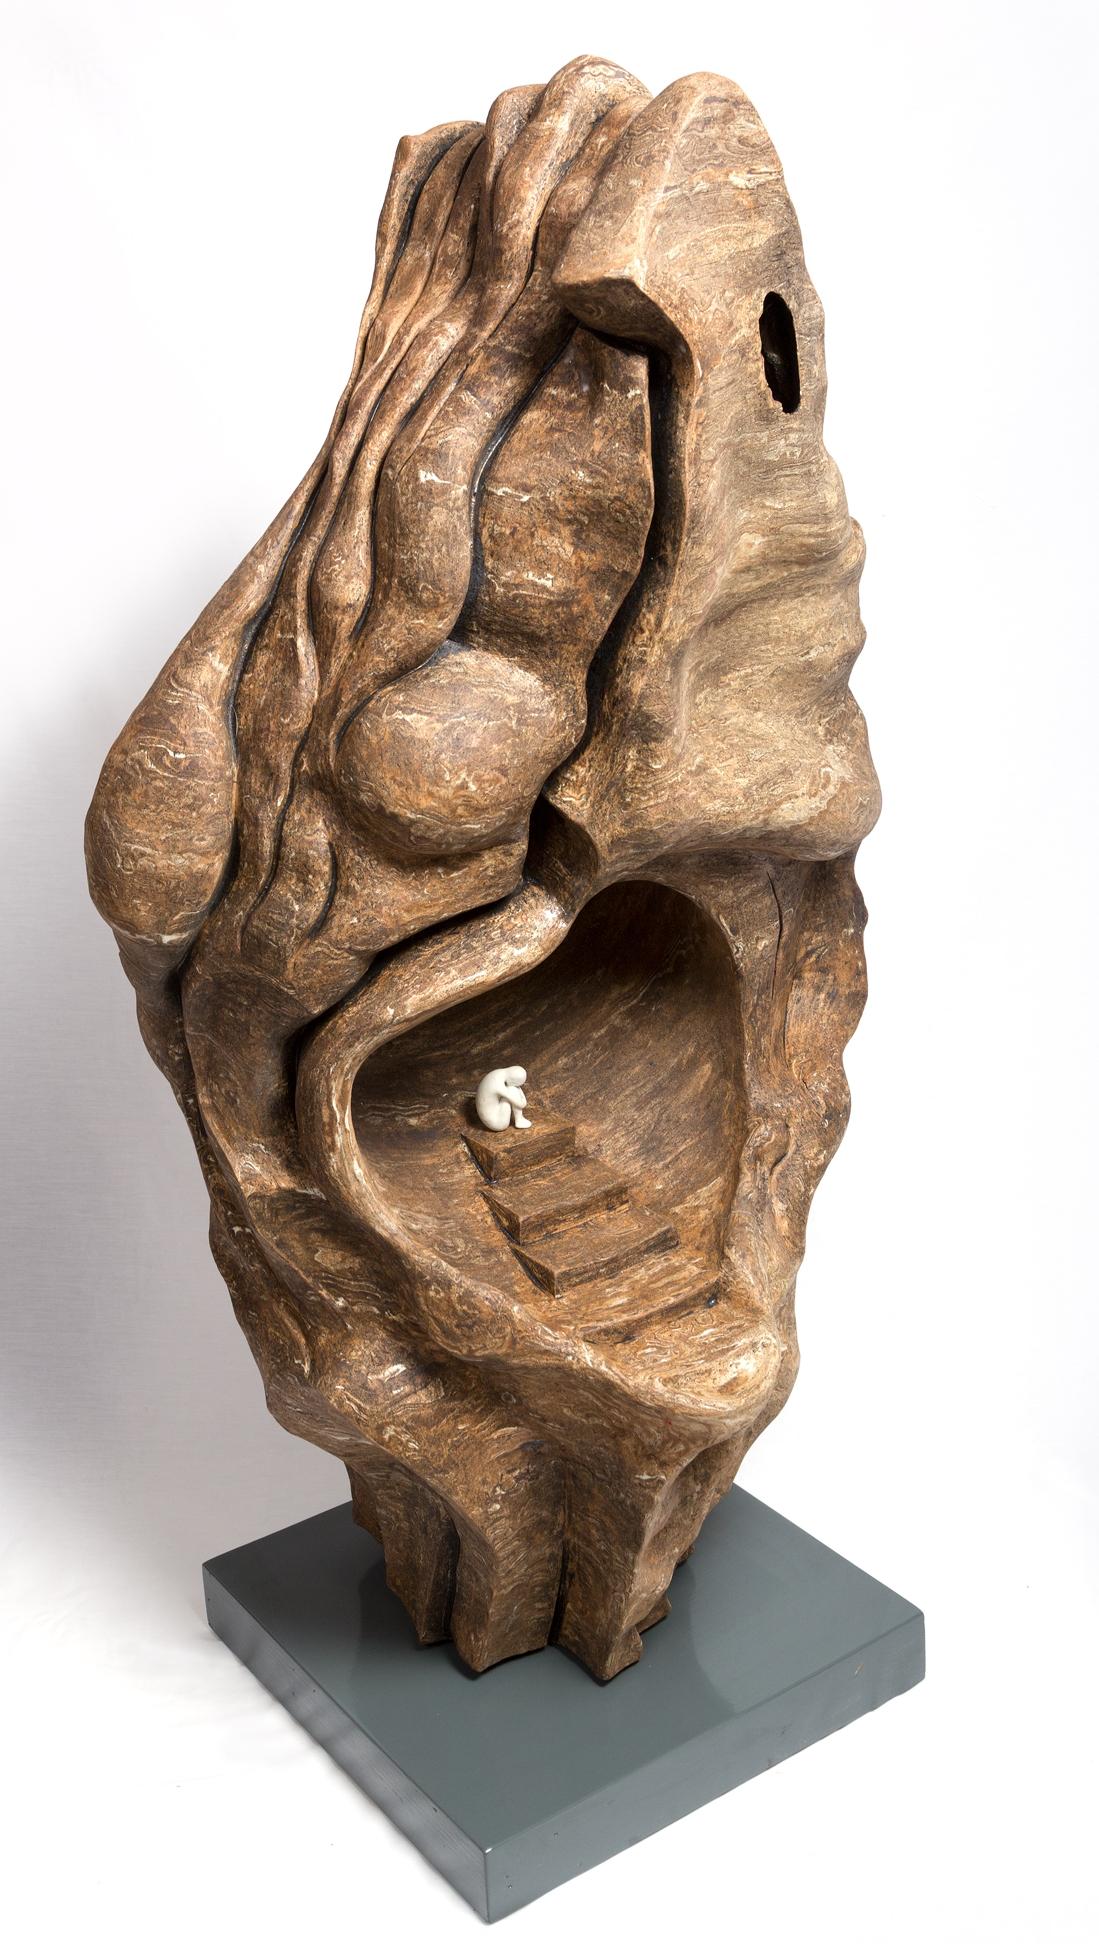 Barnes Sculpture 2.jpg